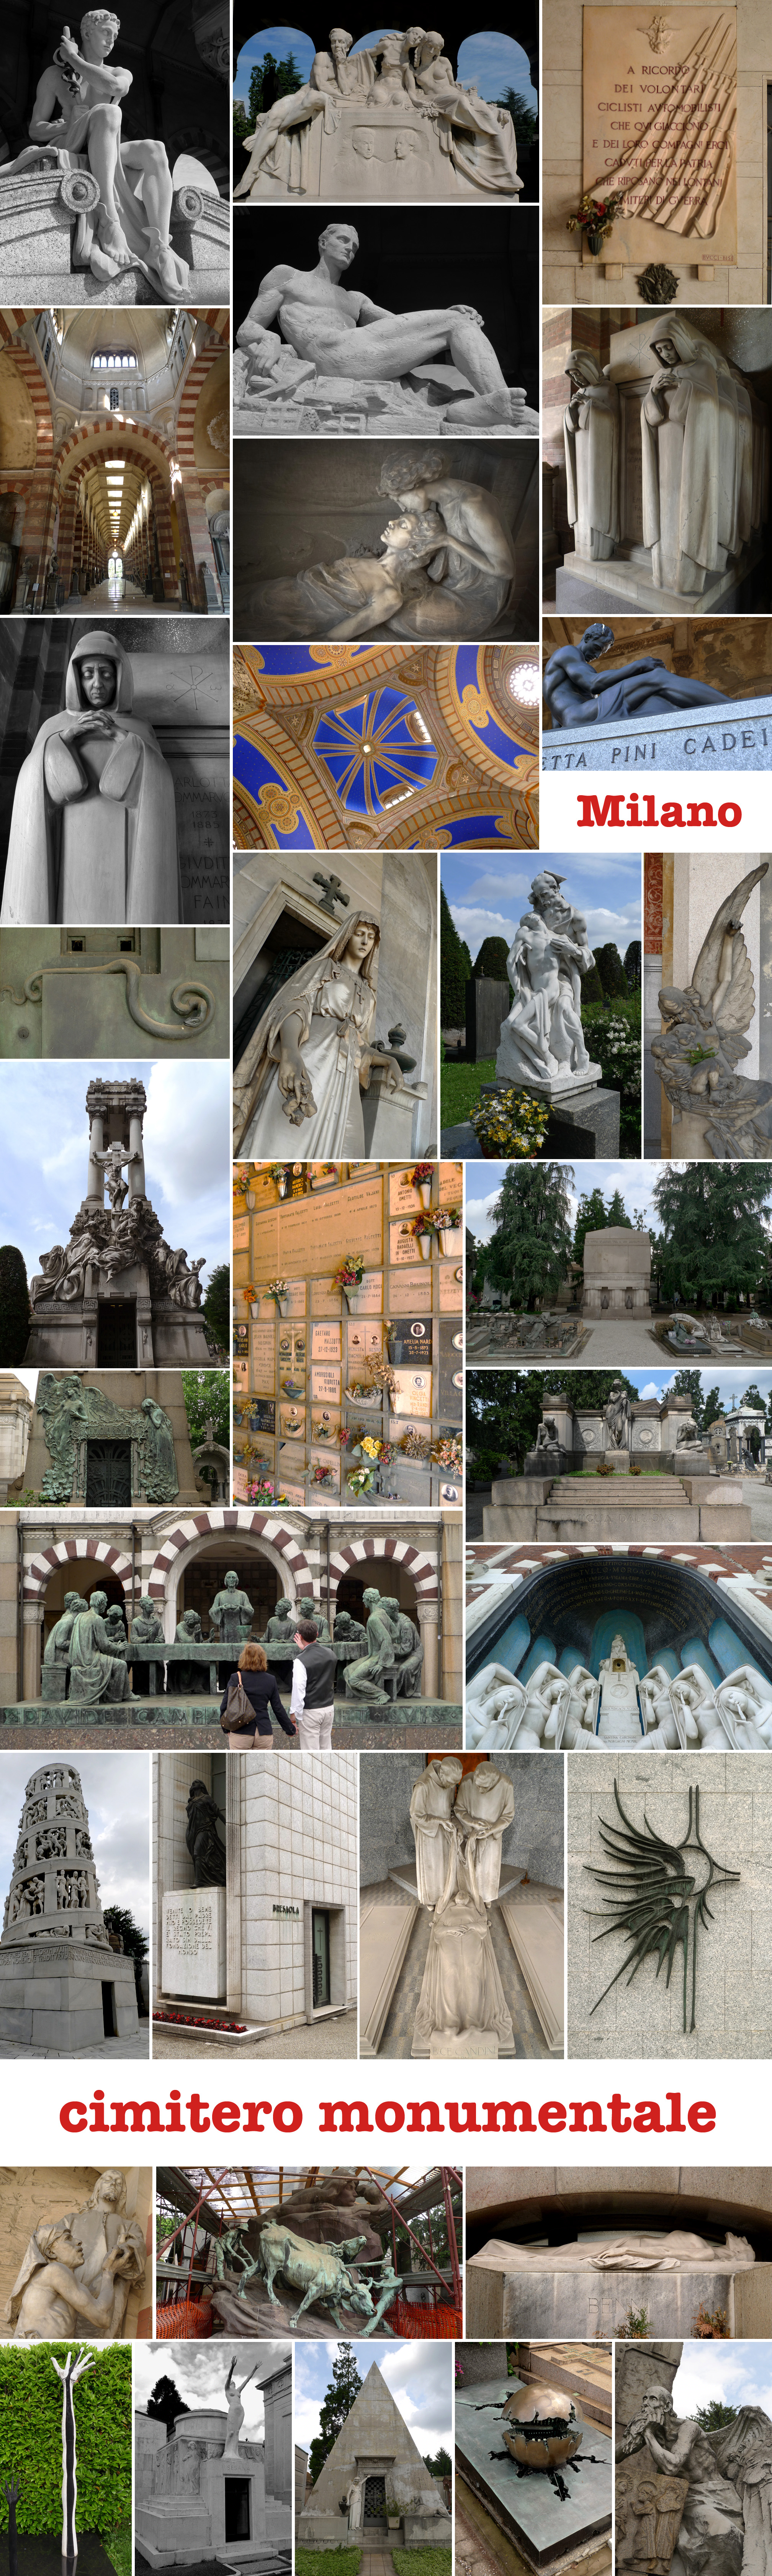 Cimitero Monumentale, Milano, map